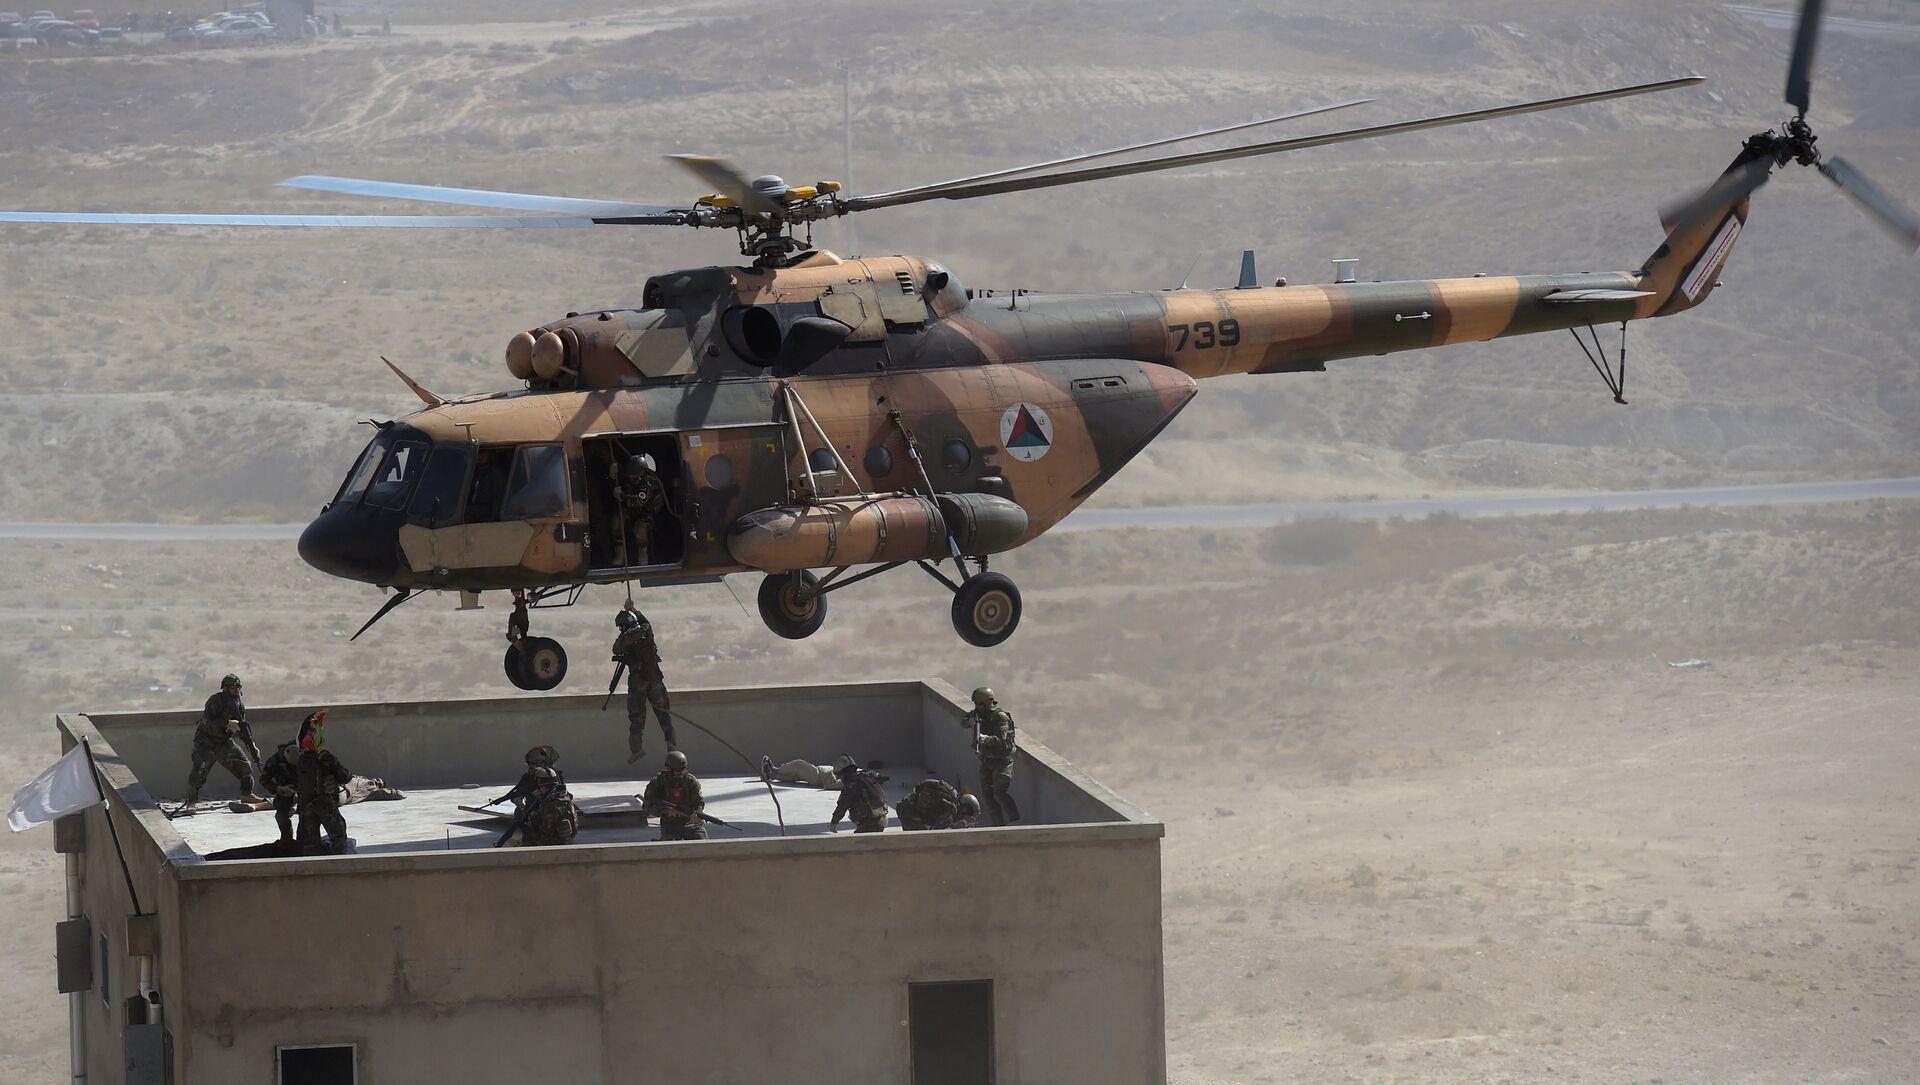 Mi-17 tipi helikopter -Afganistan - Sputnik Türkiye, 1920, 29.07.2021